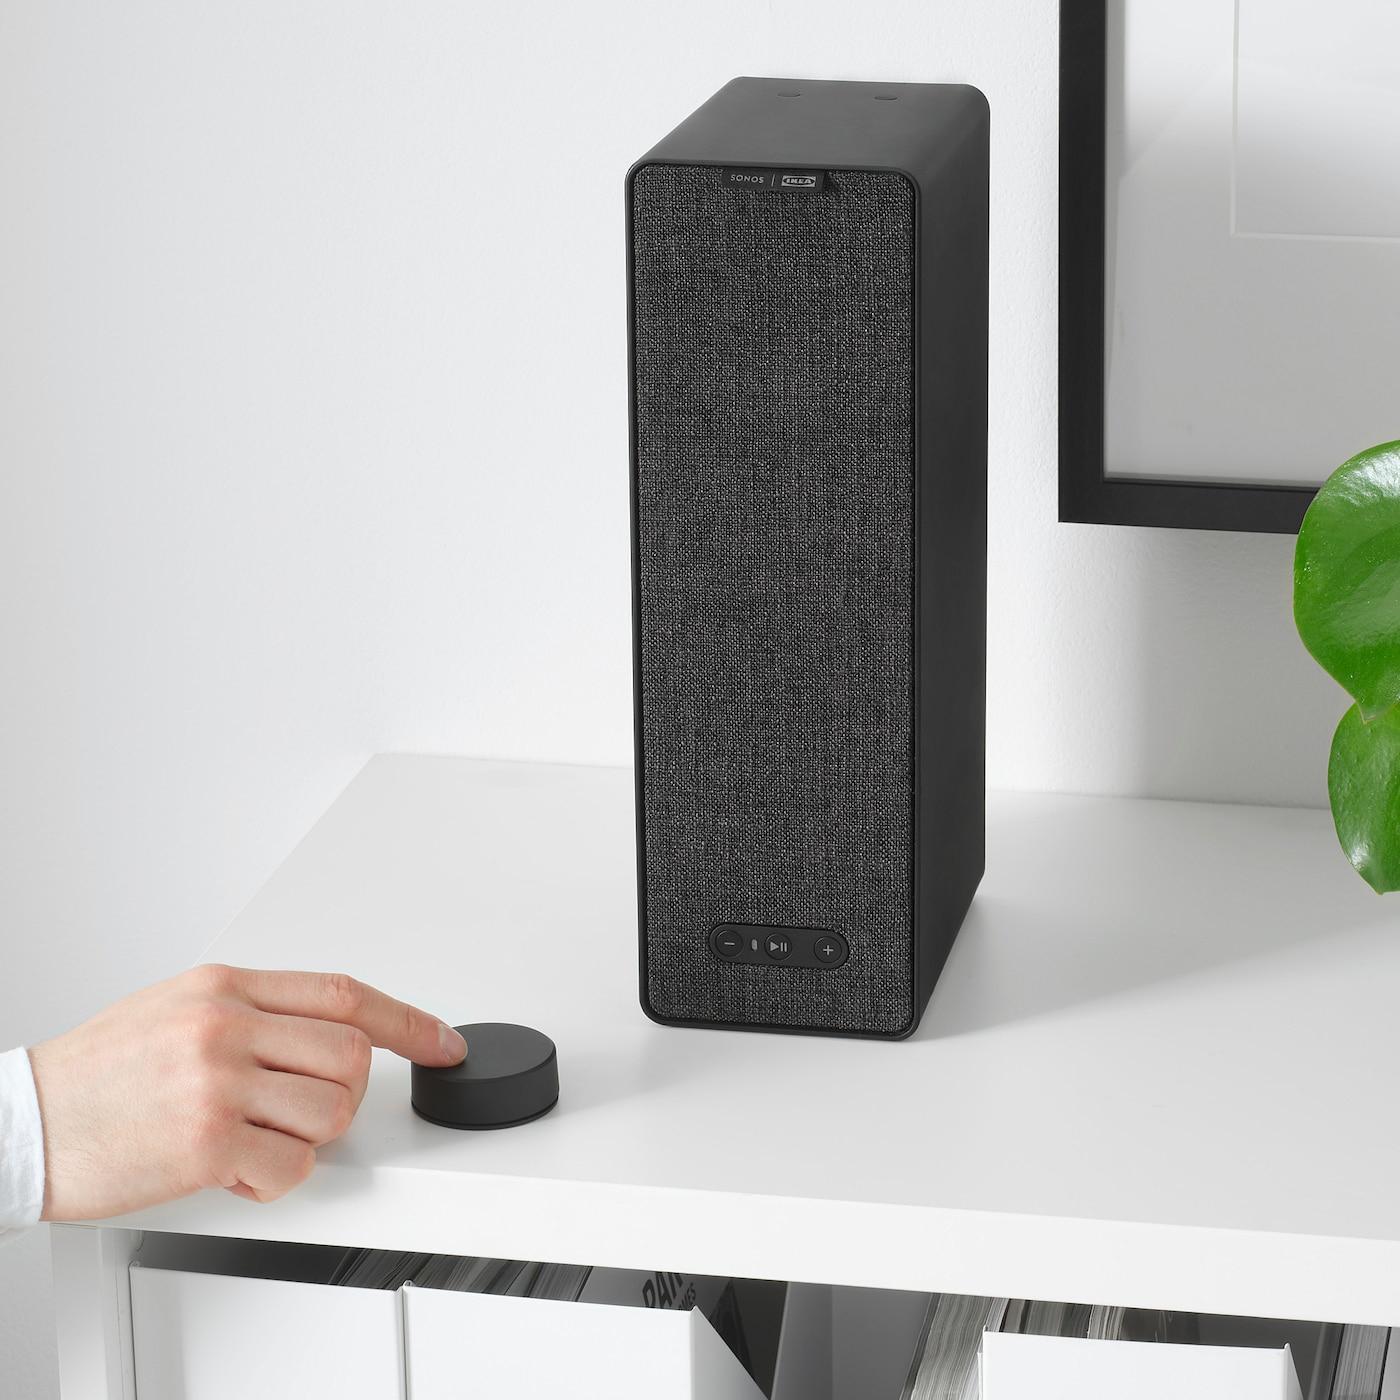 Symfonisk Télécommande Volume - Noir concernant Mobilier De Jardin Ikea